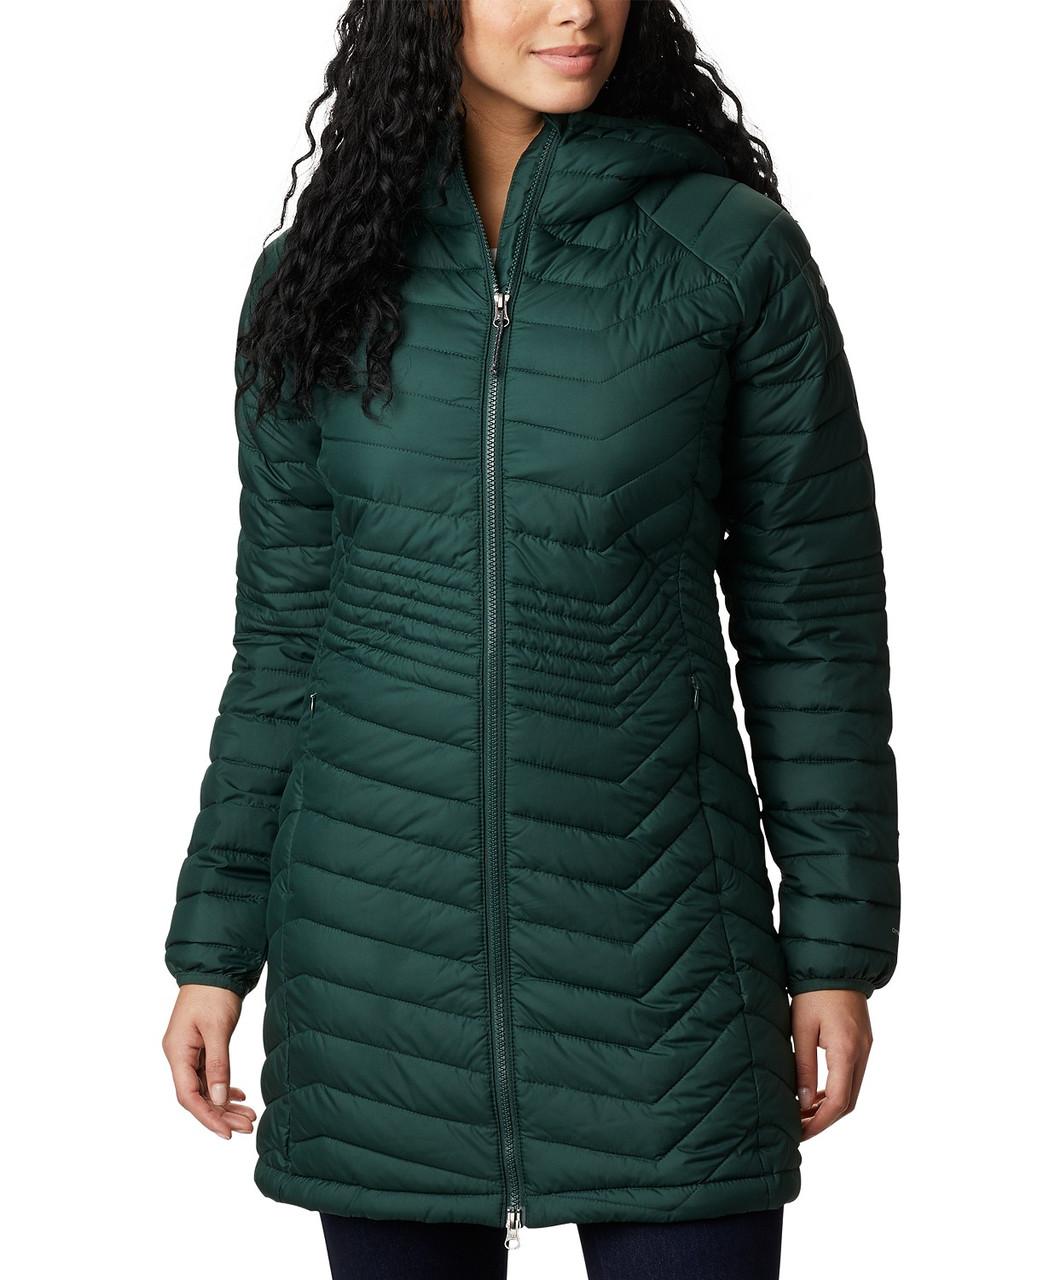 Columbia Женская куртка - Е2 - фото 1